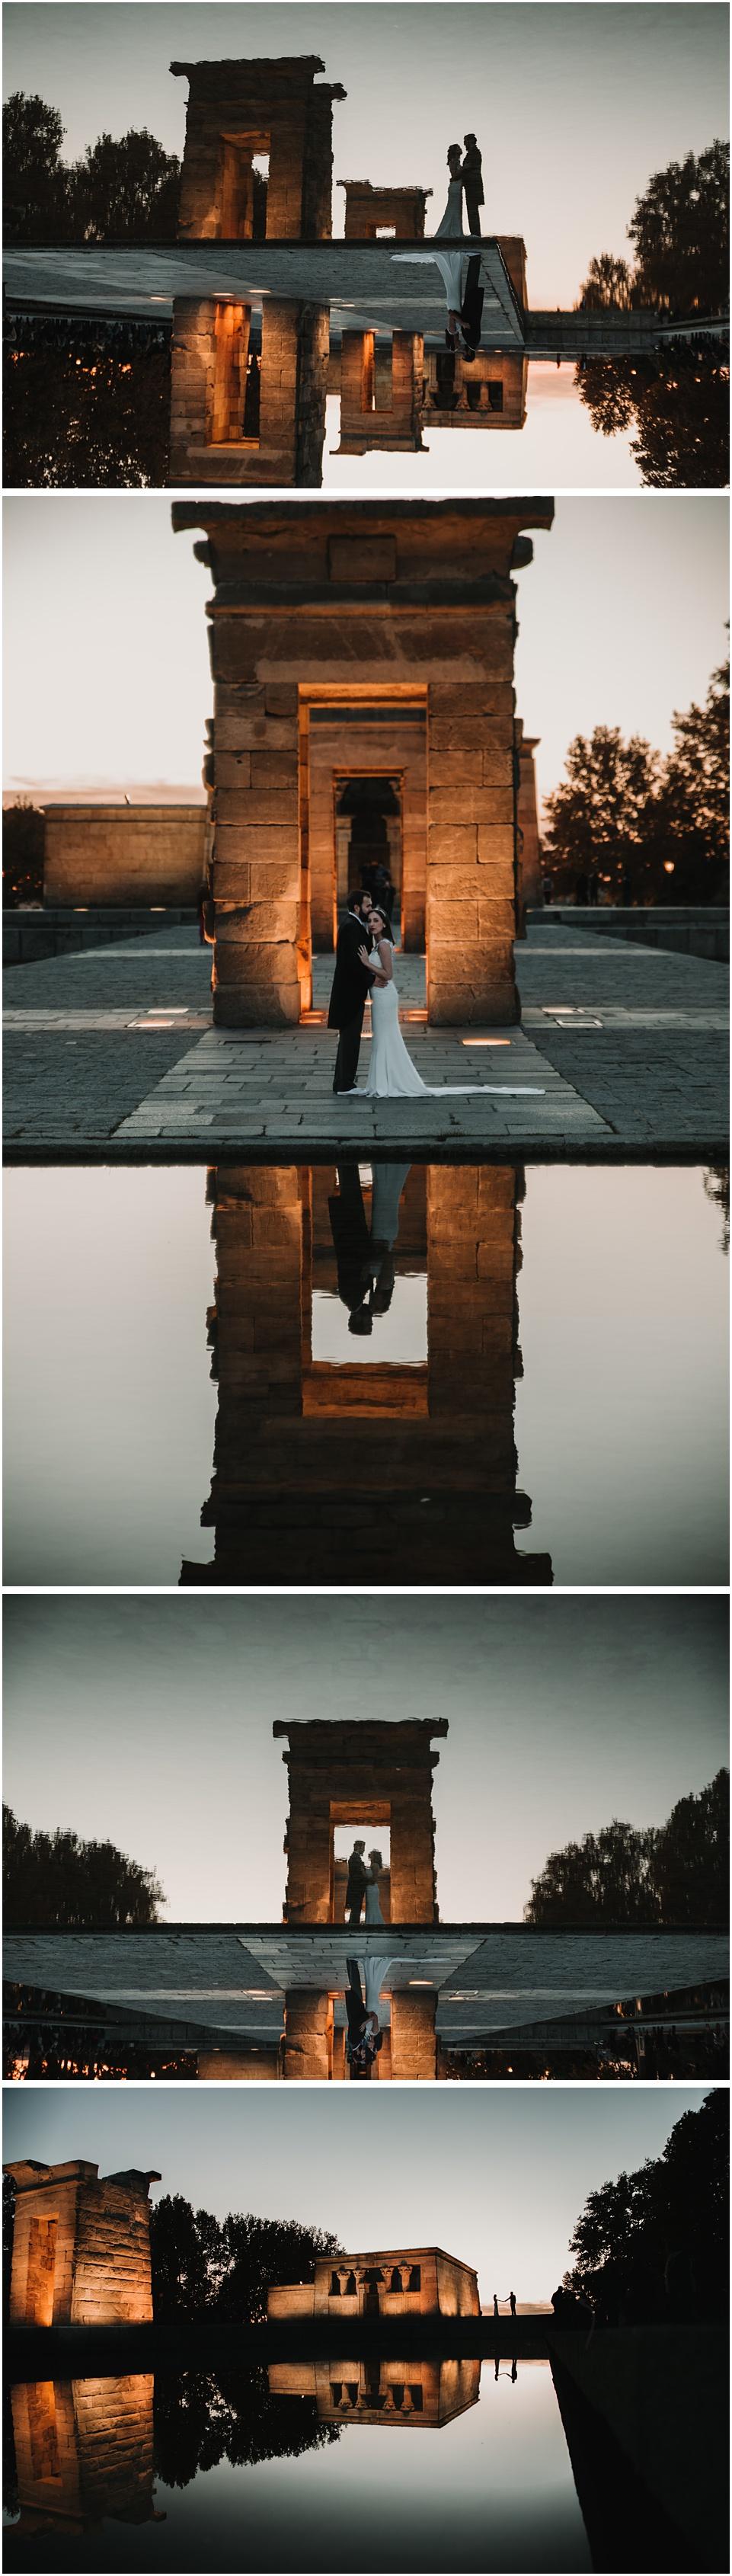 Madrid,Posboda en madrid,Postboda,Postboda en el Templo de Deboh,Postobda en el Retiro,fotografia de boda,fotografo de boda,fotografos de boda en jaen,jaen,